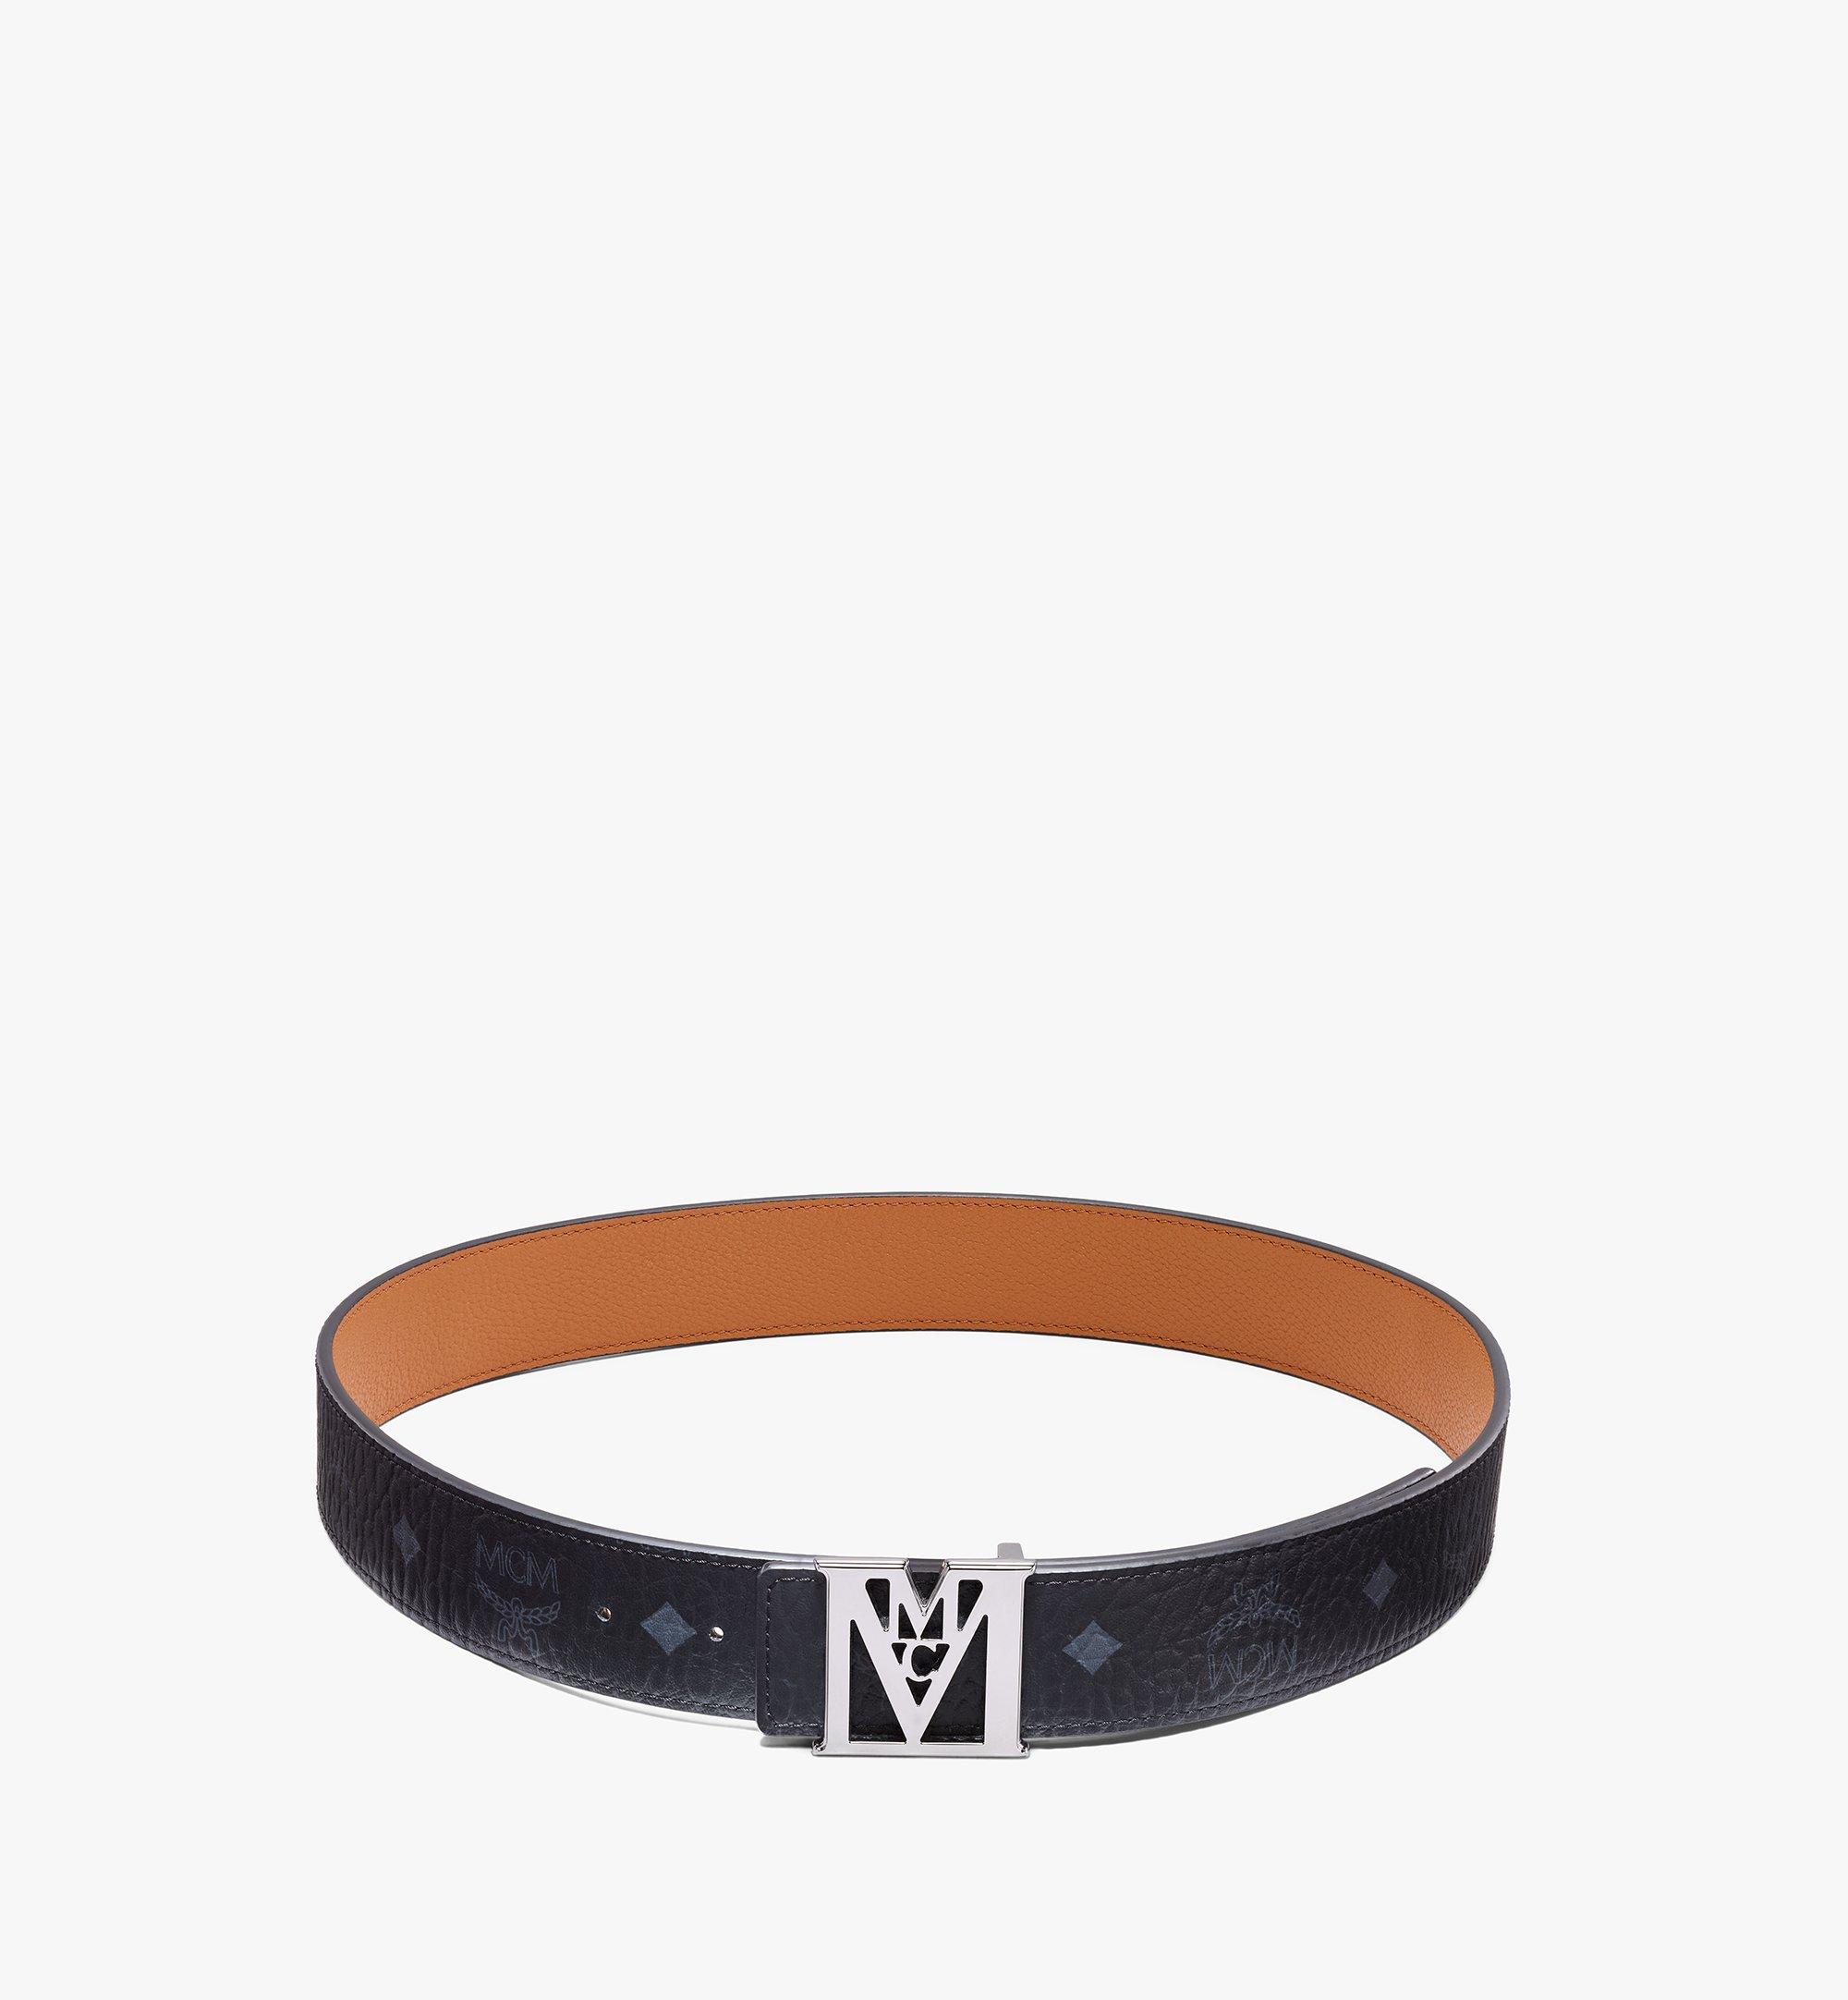 MCM Visetos 系列 Lea M 1.5 吋可翻轉使用皮帶 Black MXBAALM03BK100 更多視圖 2